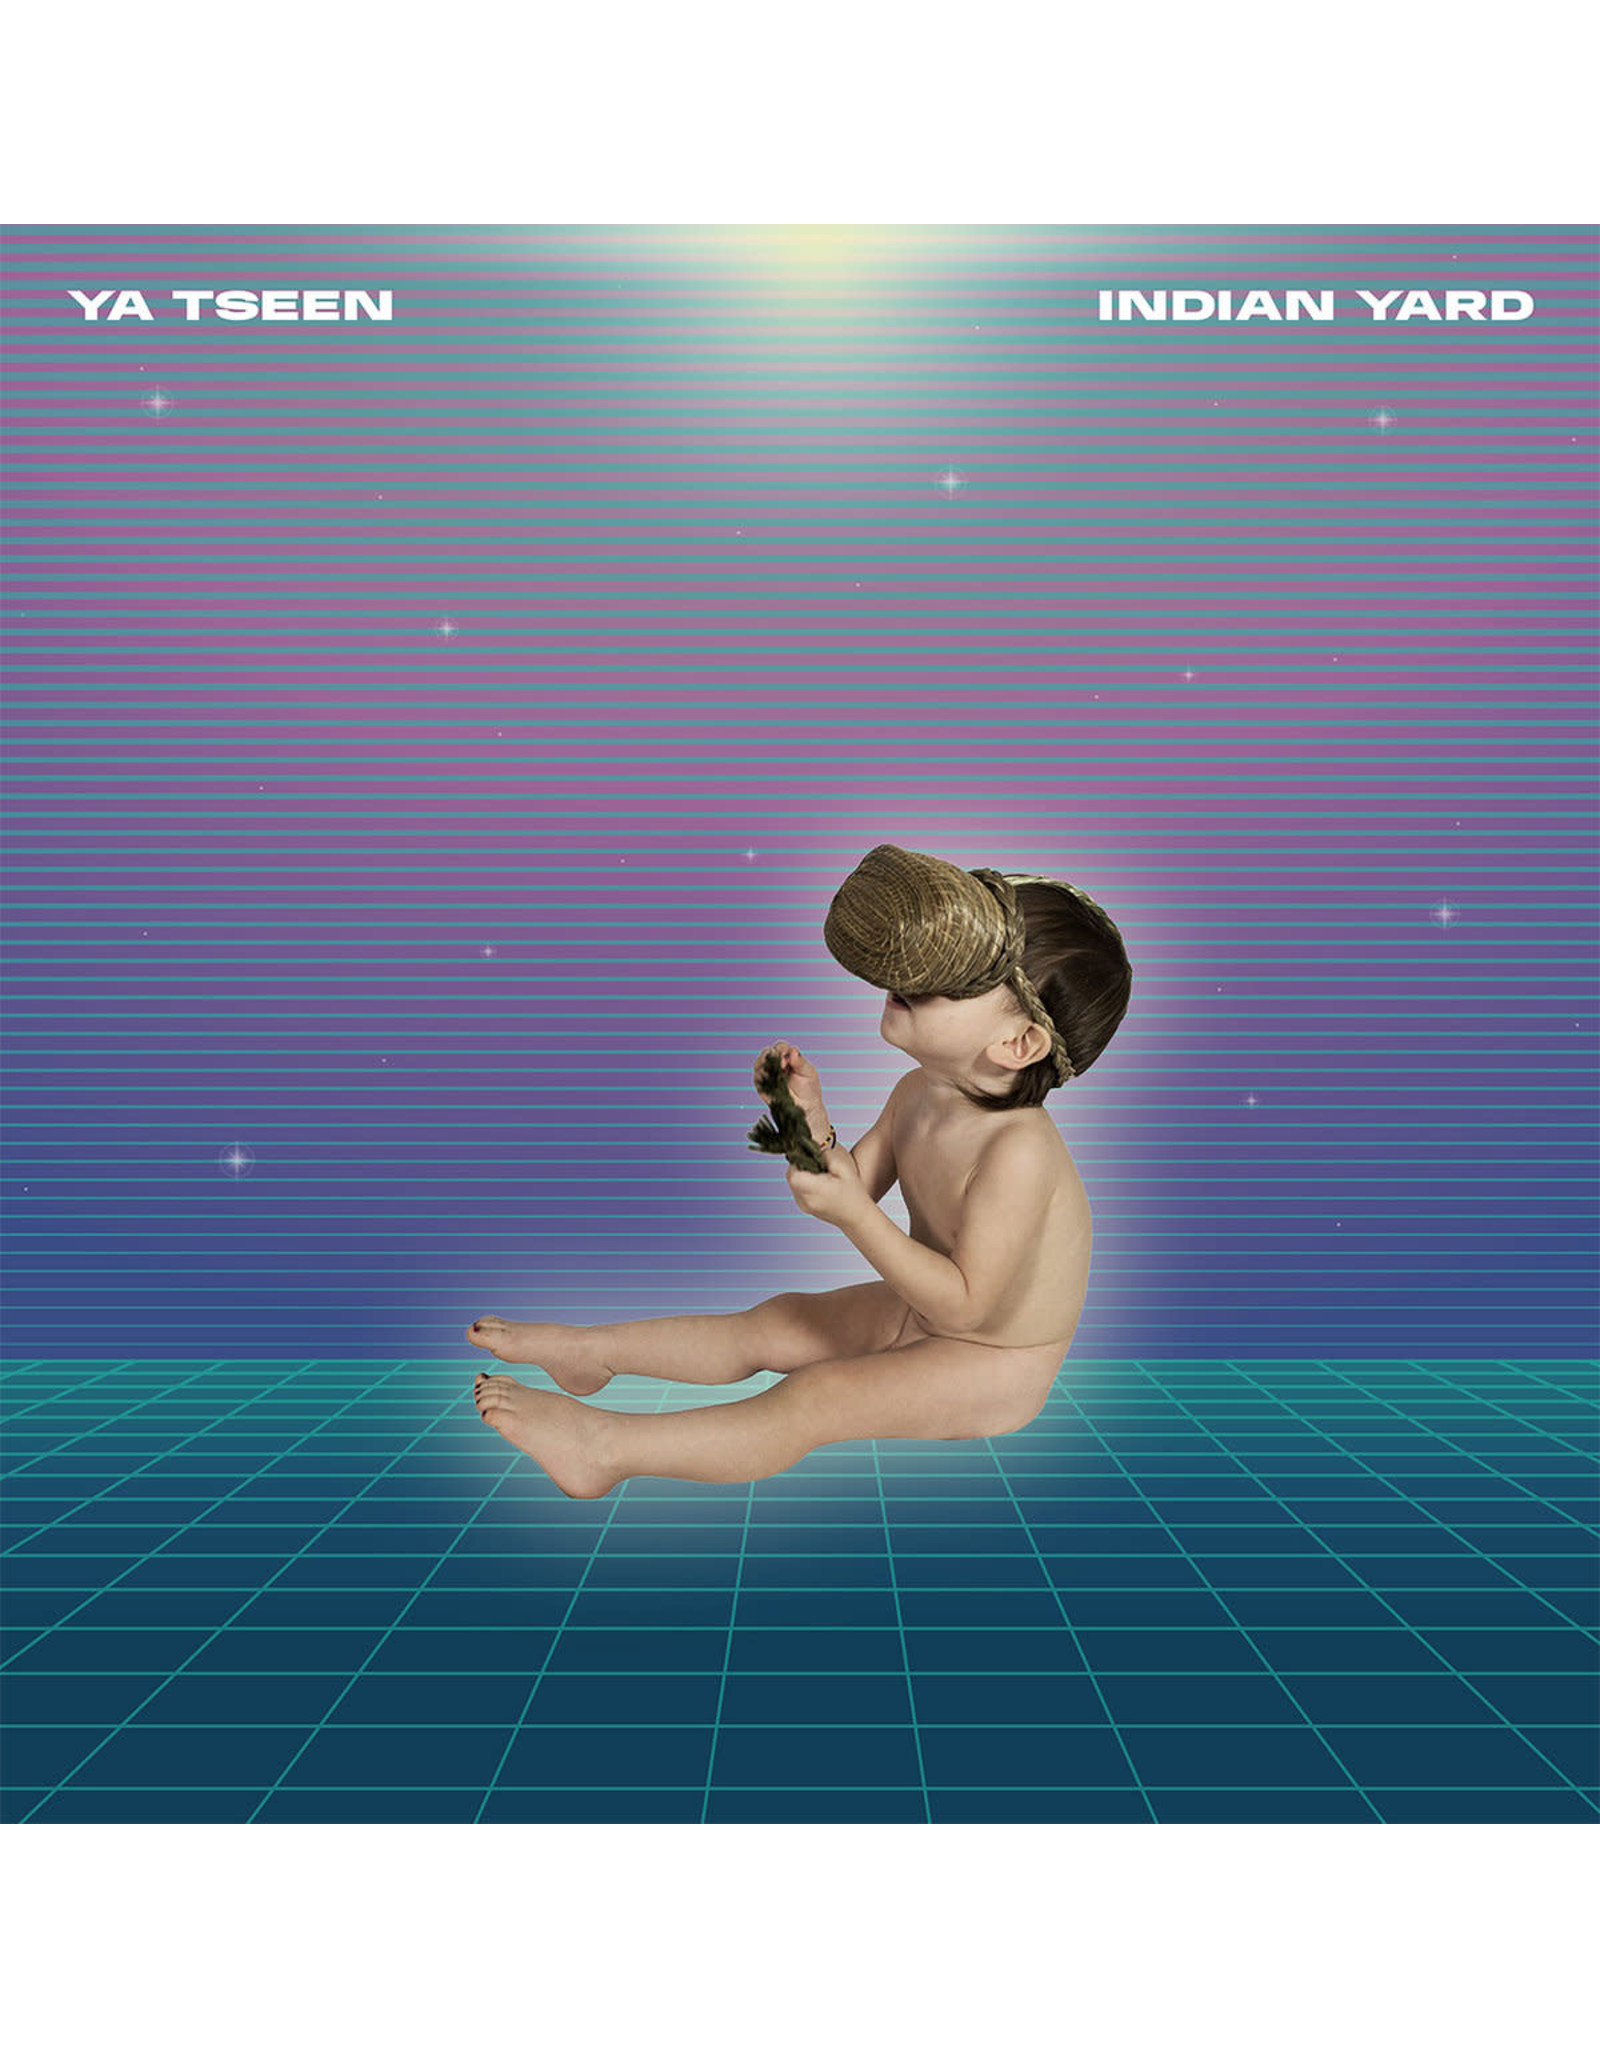 New Vinyl Ya Tseen - Indian Yard LP